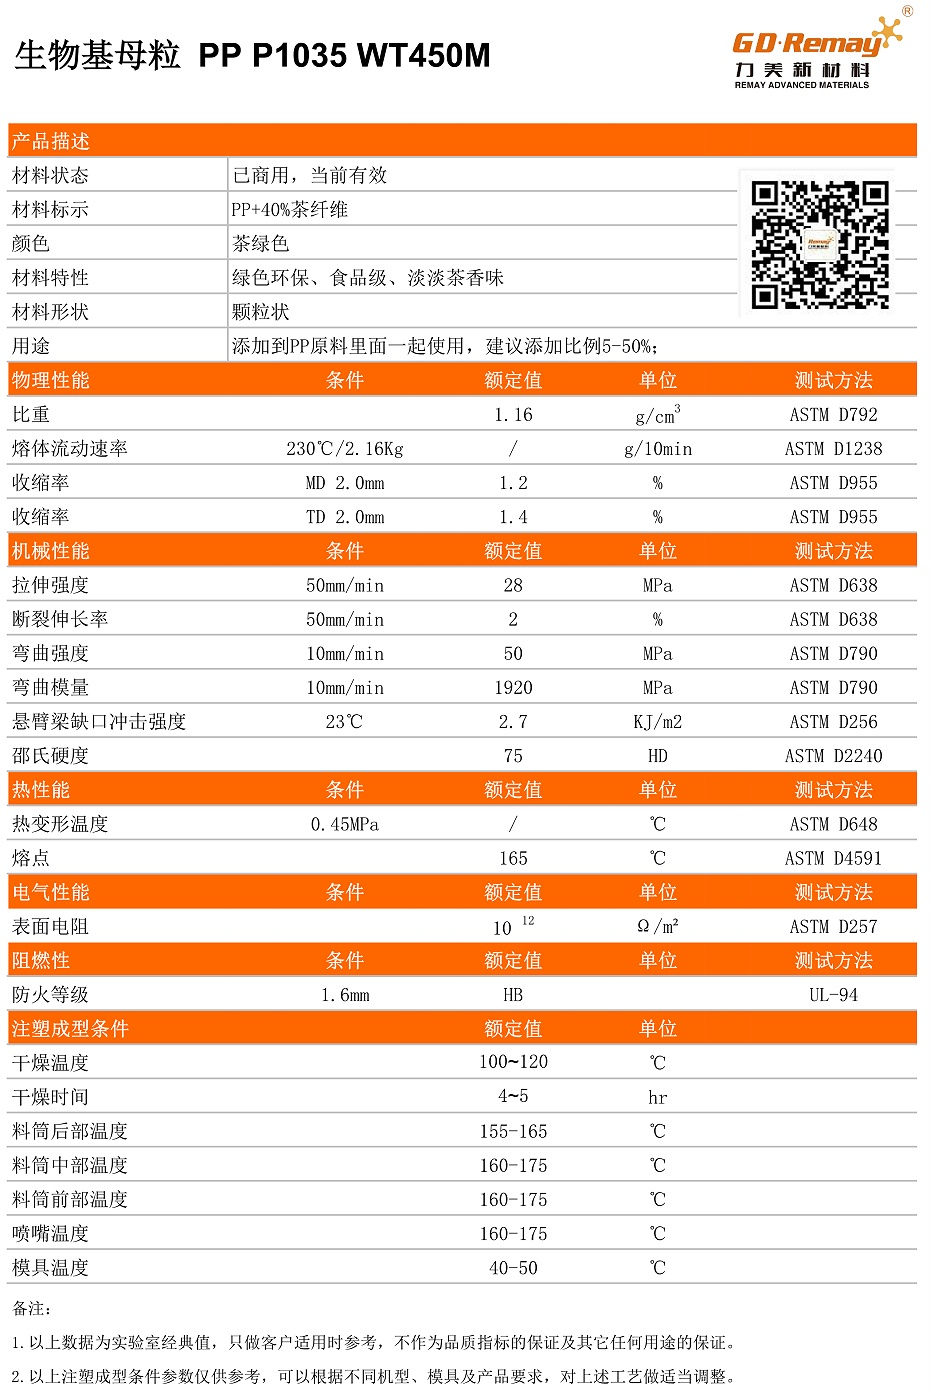 PP茶纤维母粒物性表